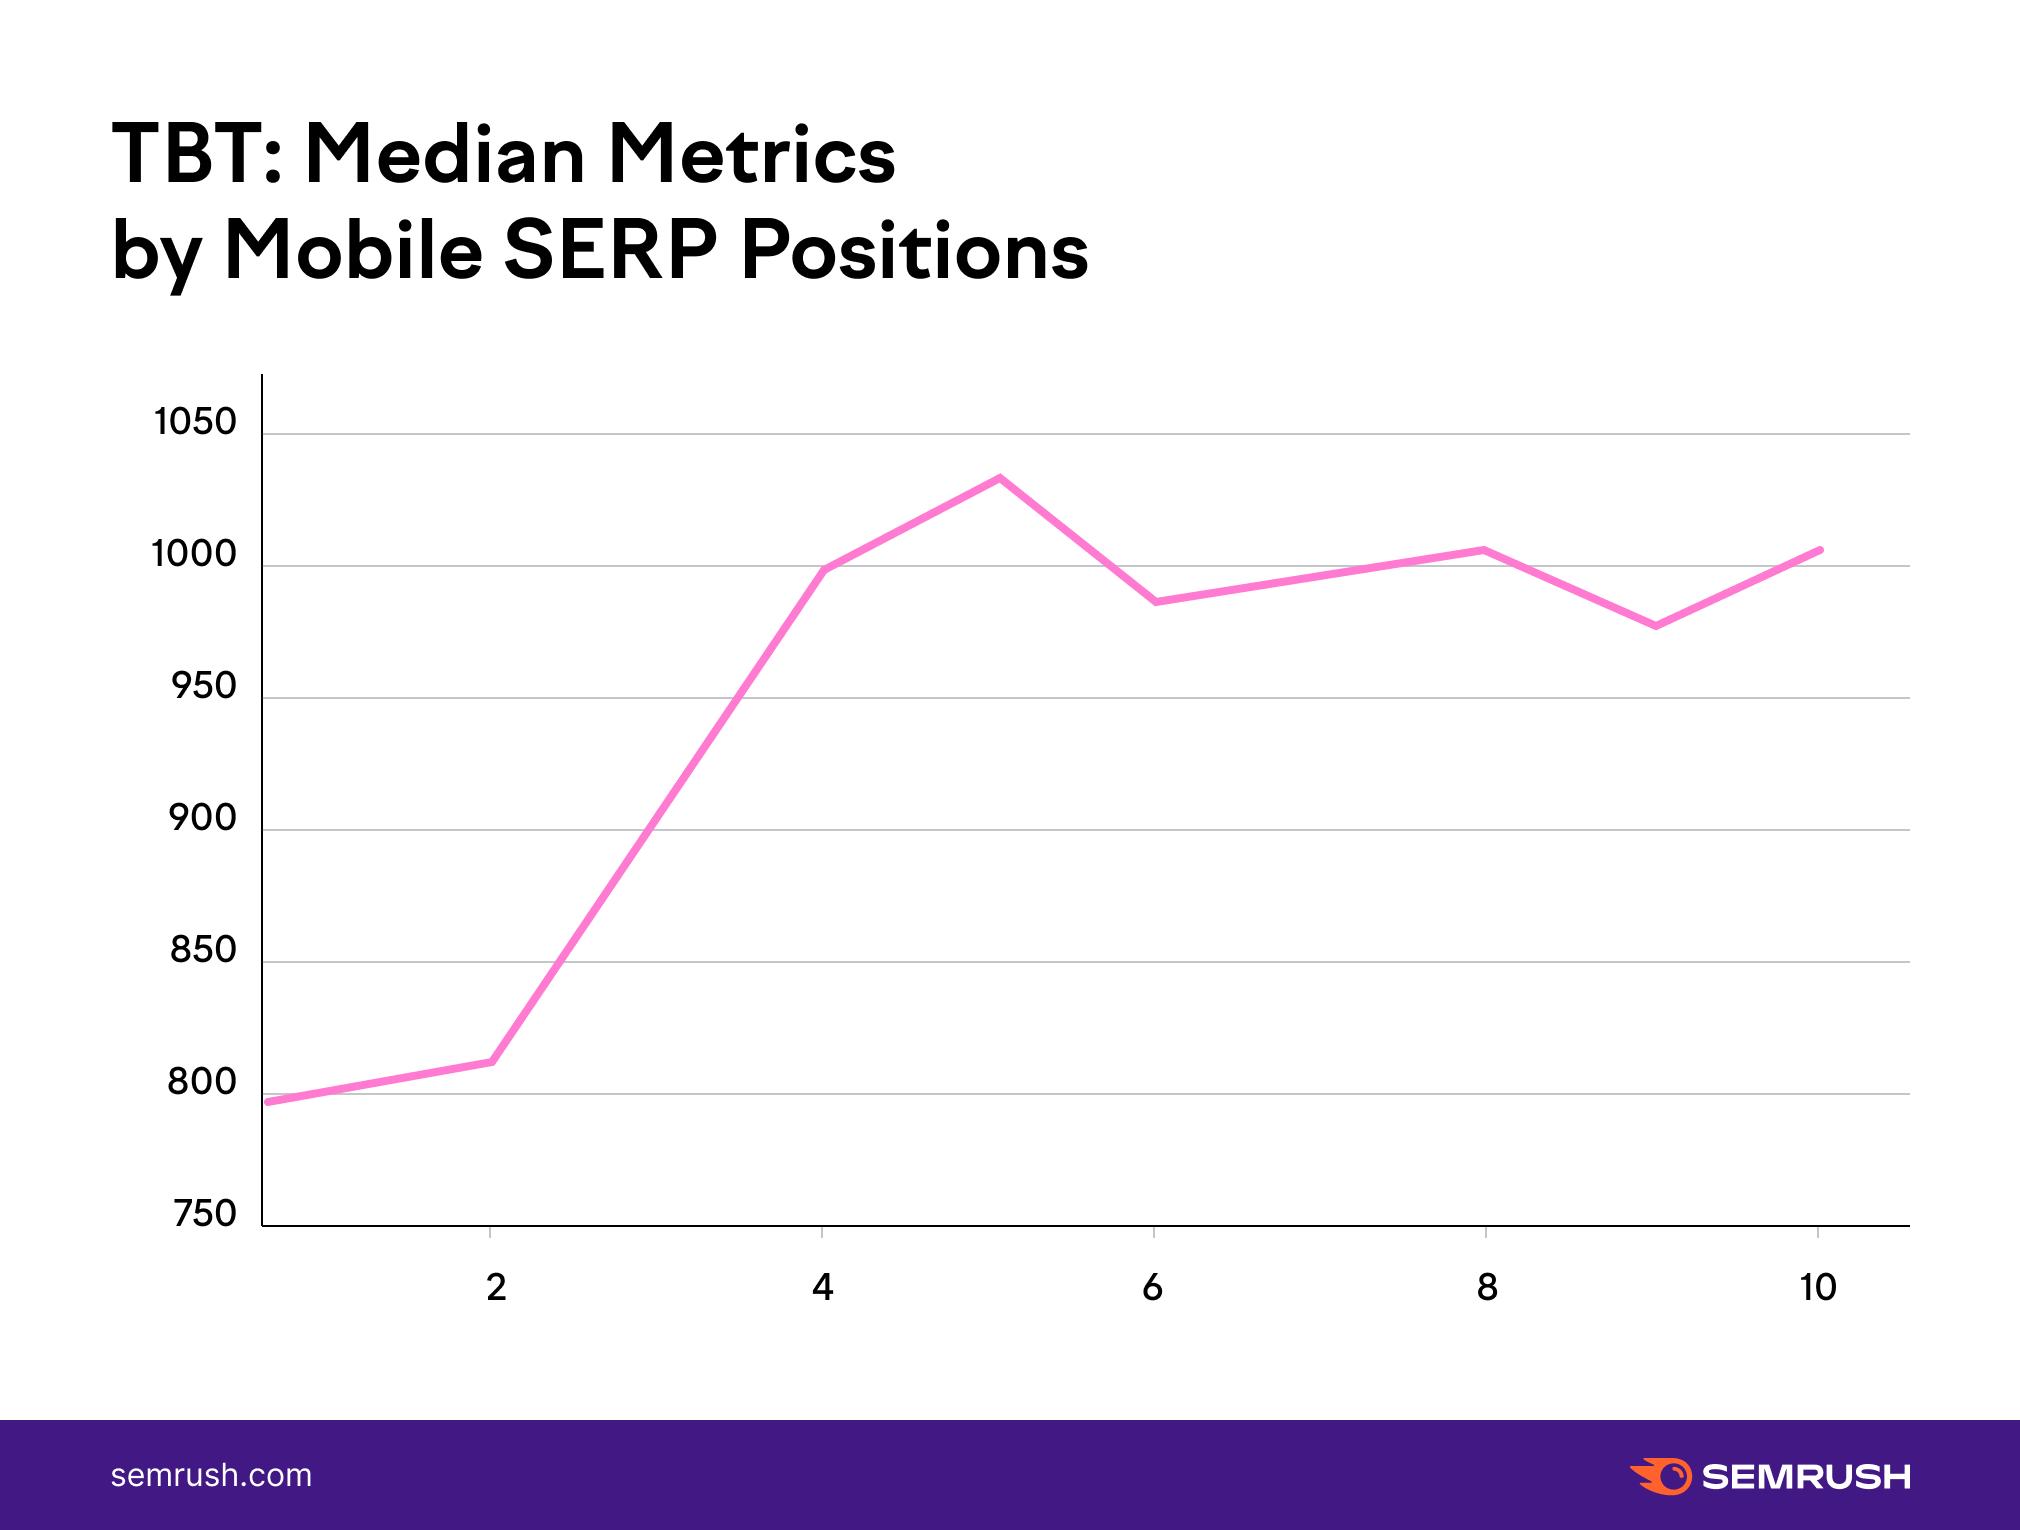 11 TBT median metrics position on SERP